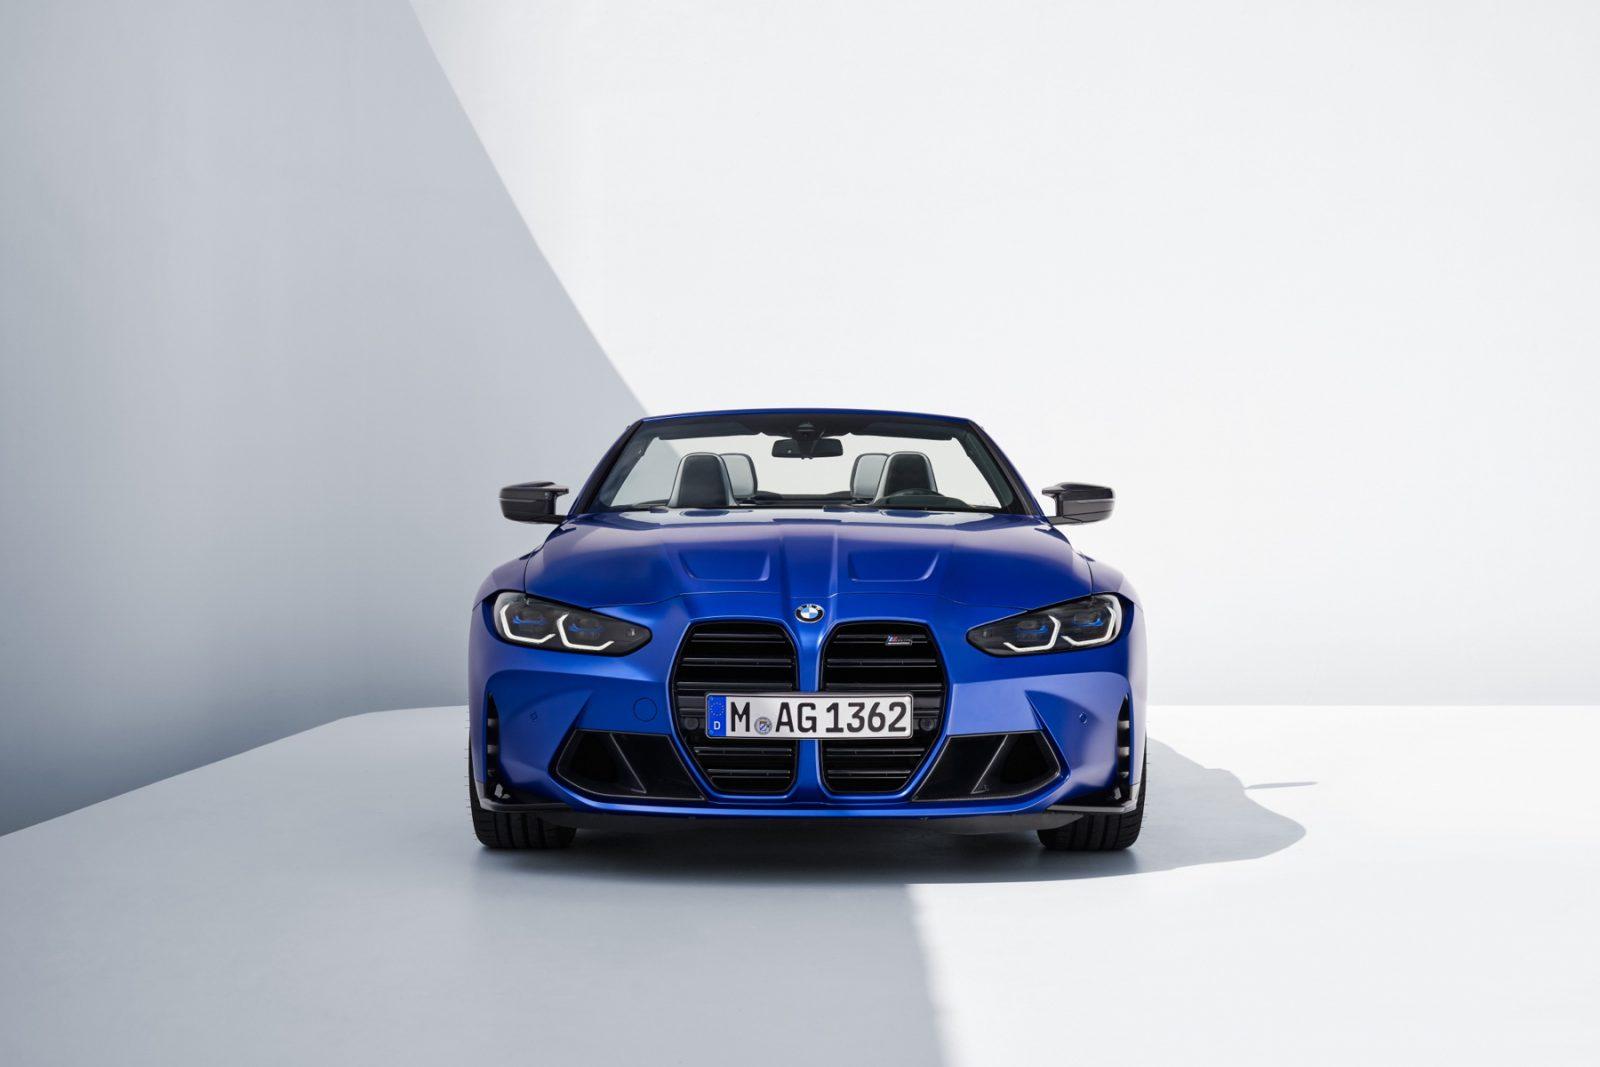 2022 BMW M4 convertible